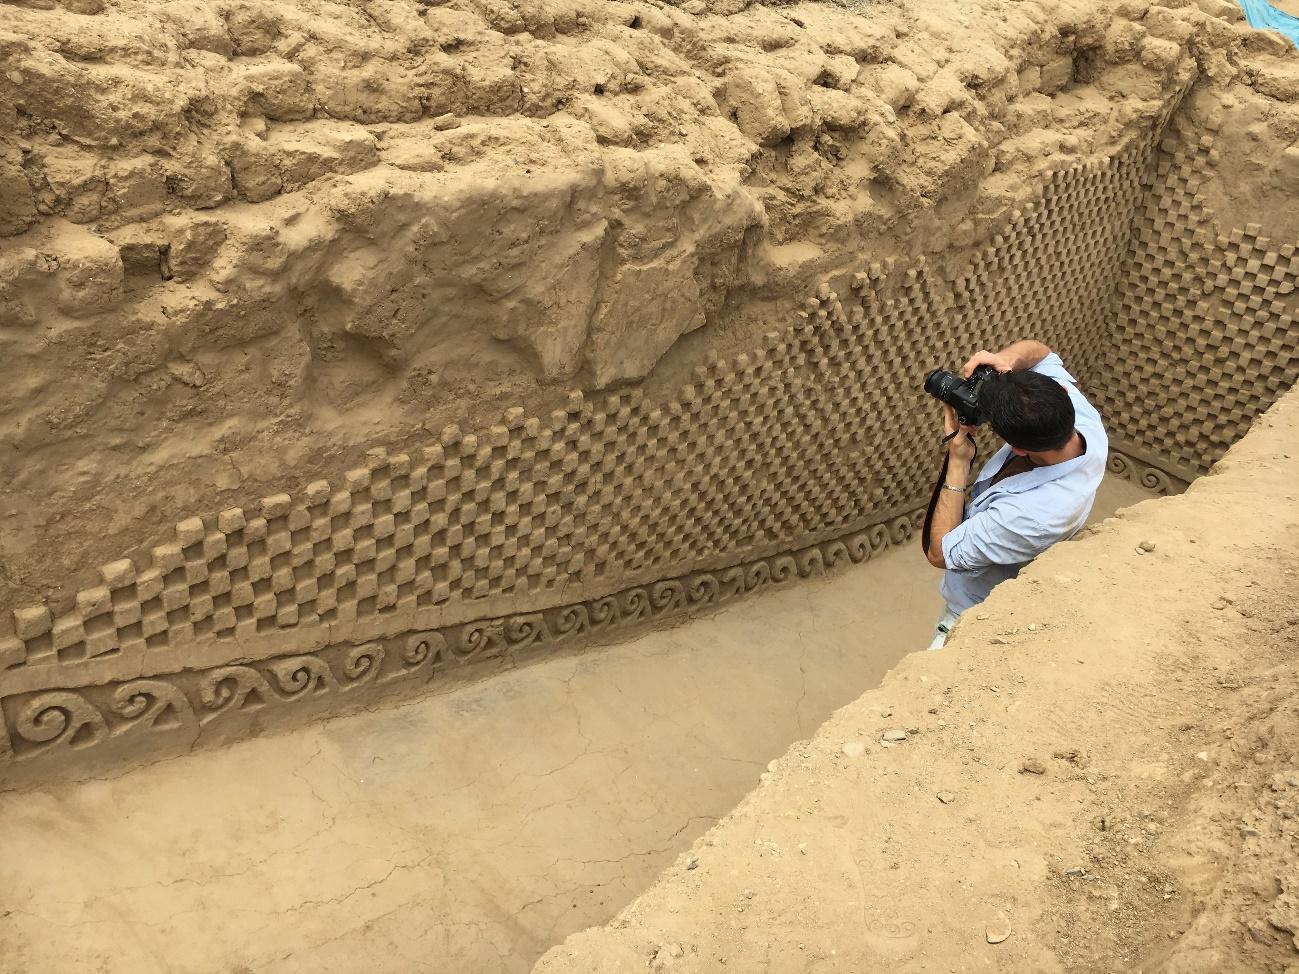 Missione archeologica nell'area del Chan Chan